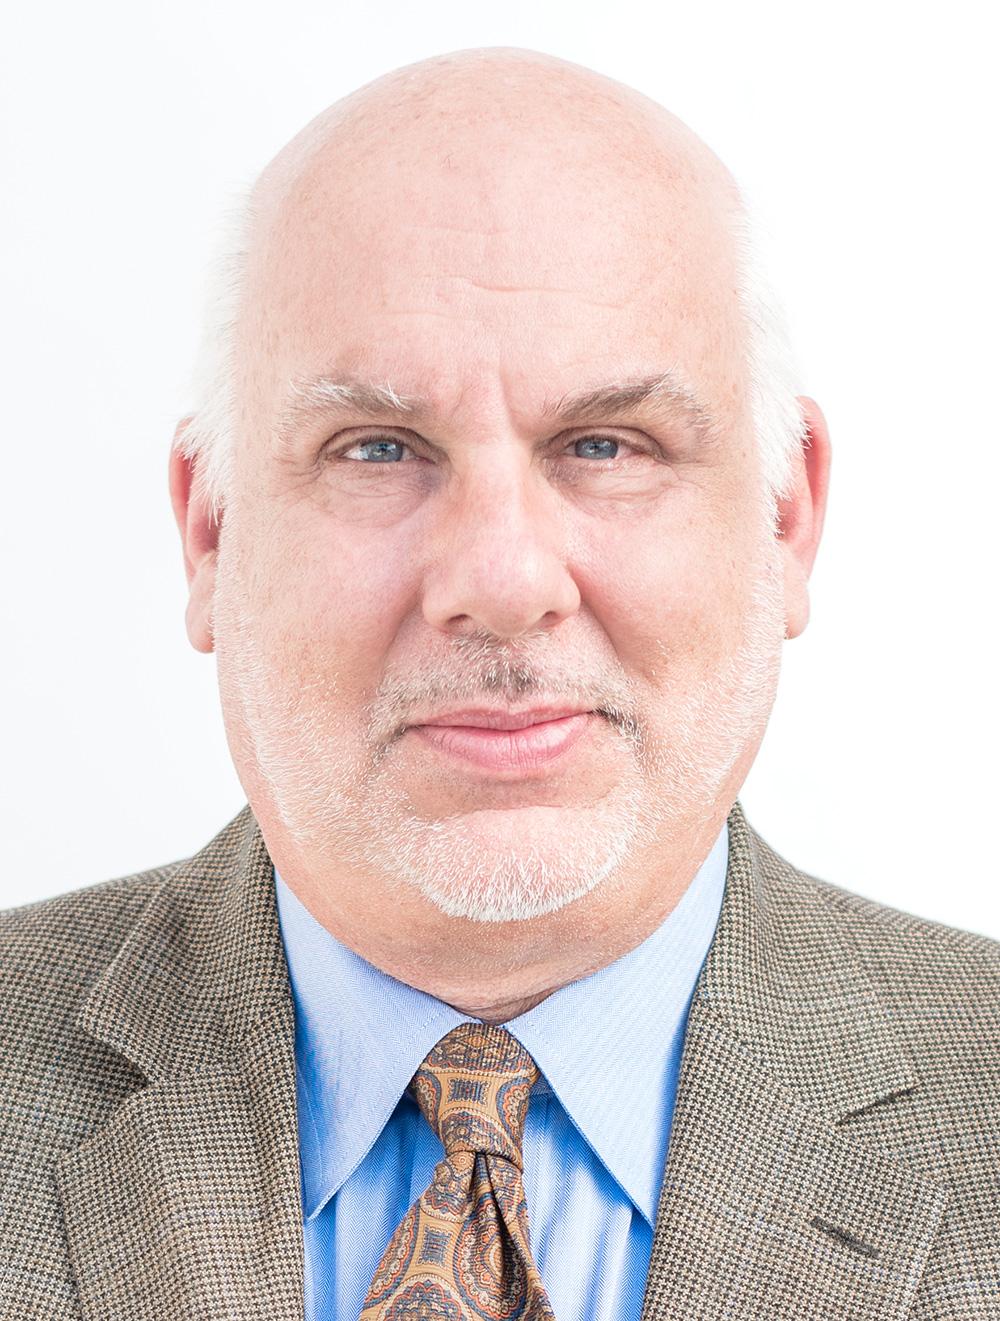 Jon Vilagi